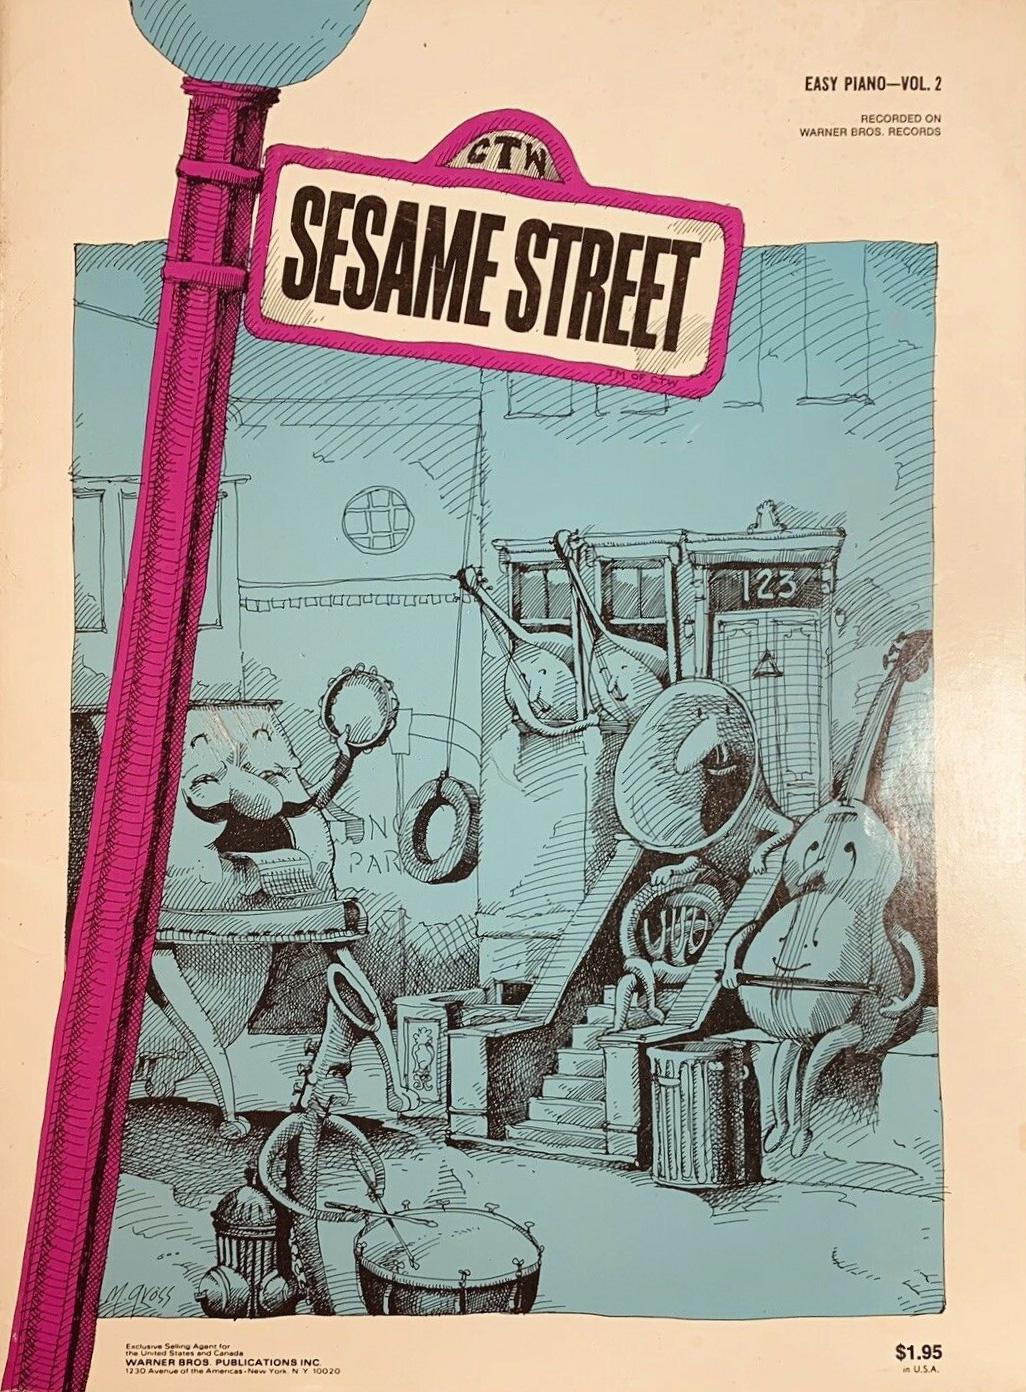 File:Sesame easy piano sheet music 2.jpg